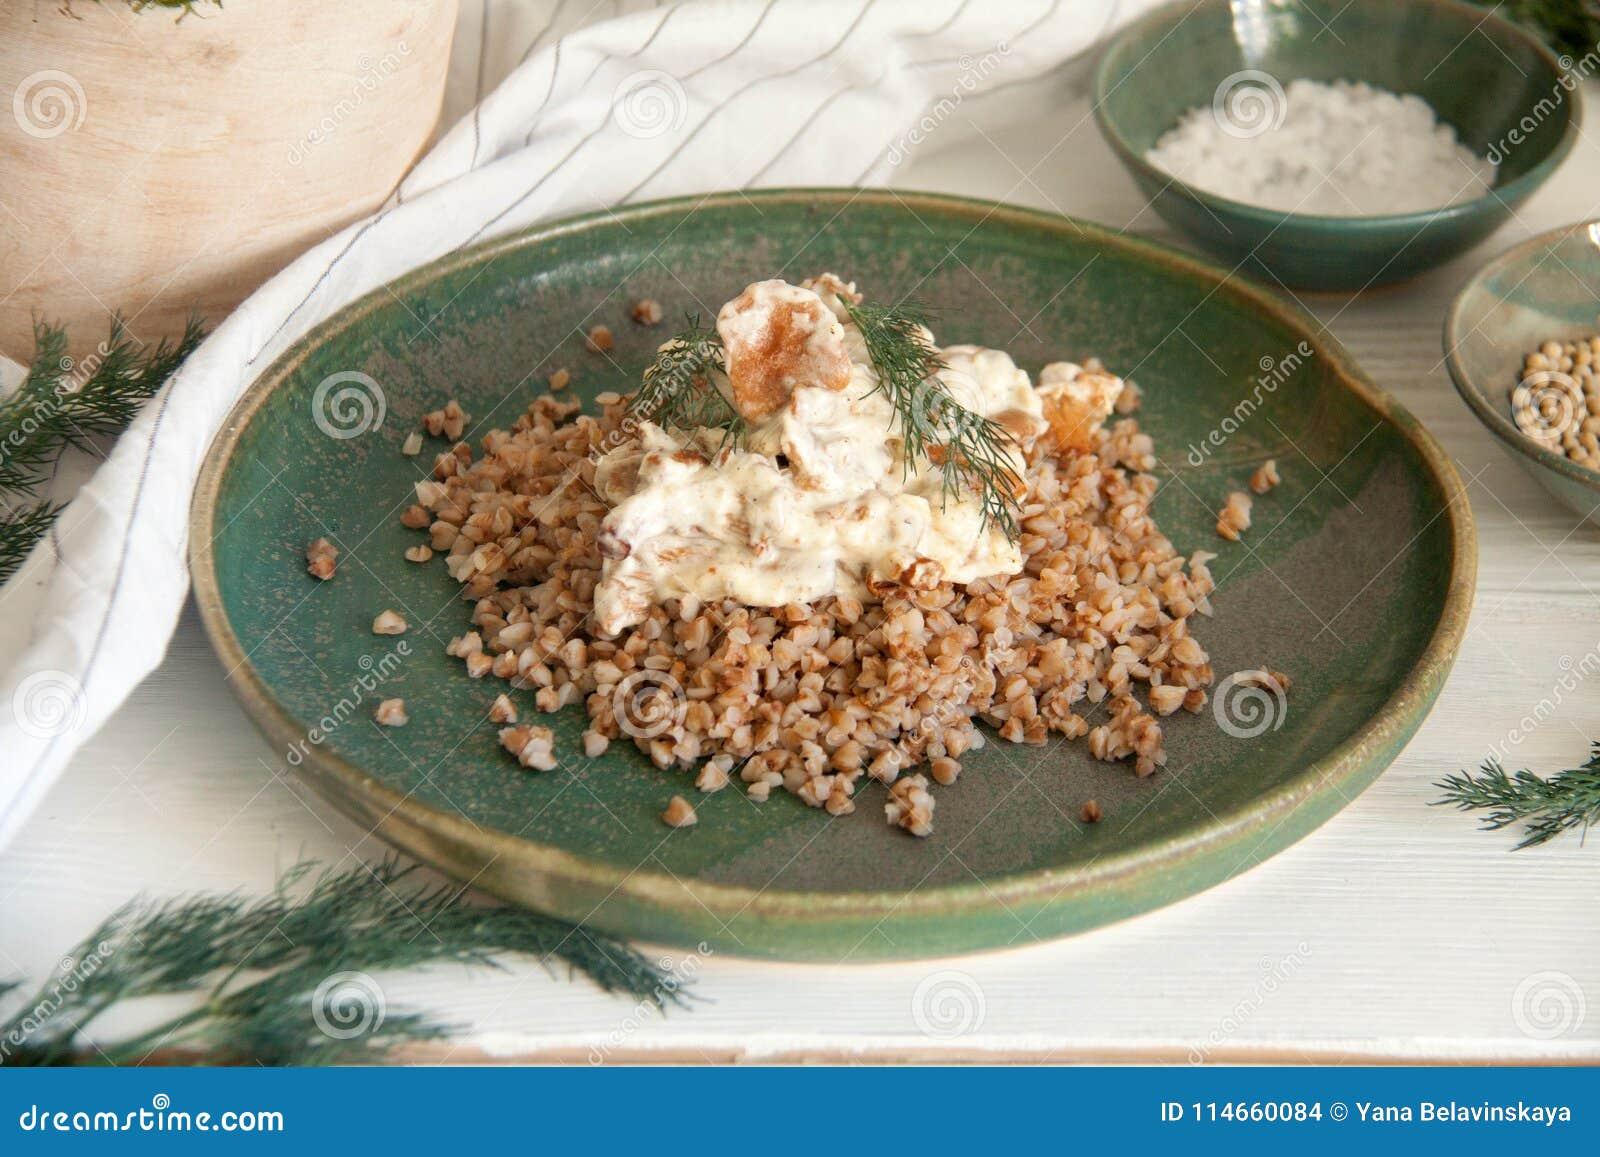 Buckwheat with mushrooms in sour cream sauce